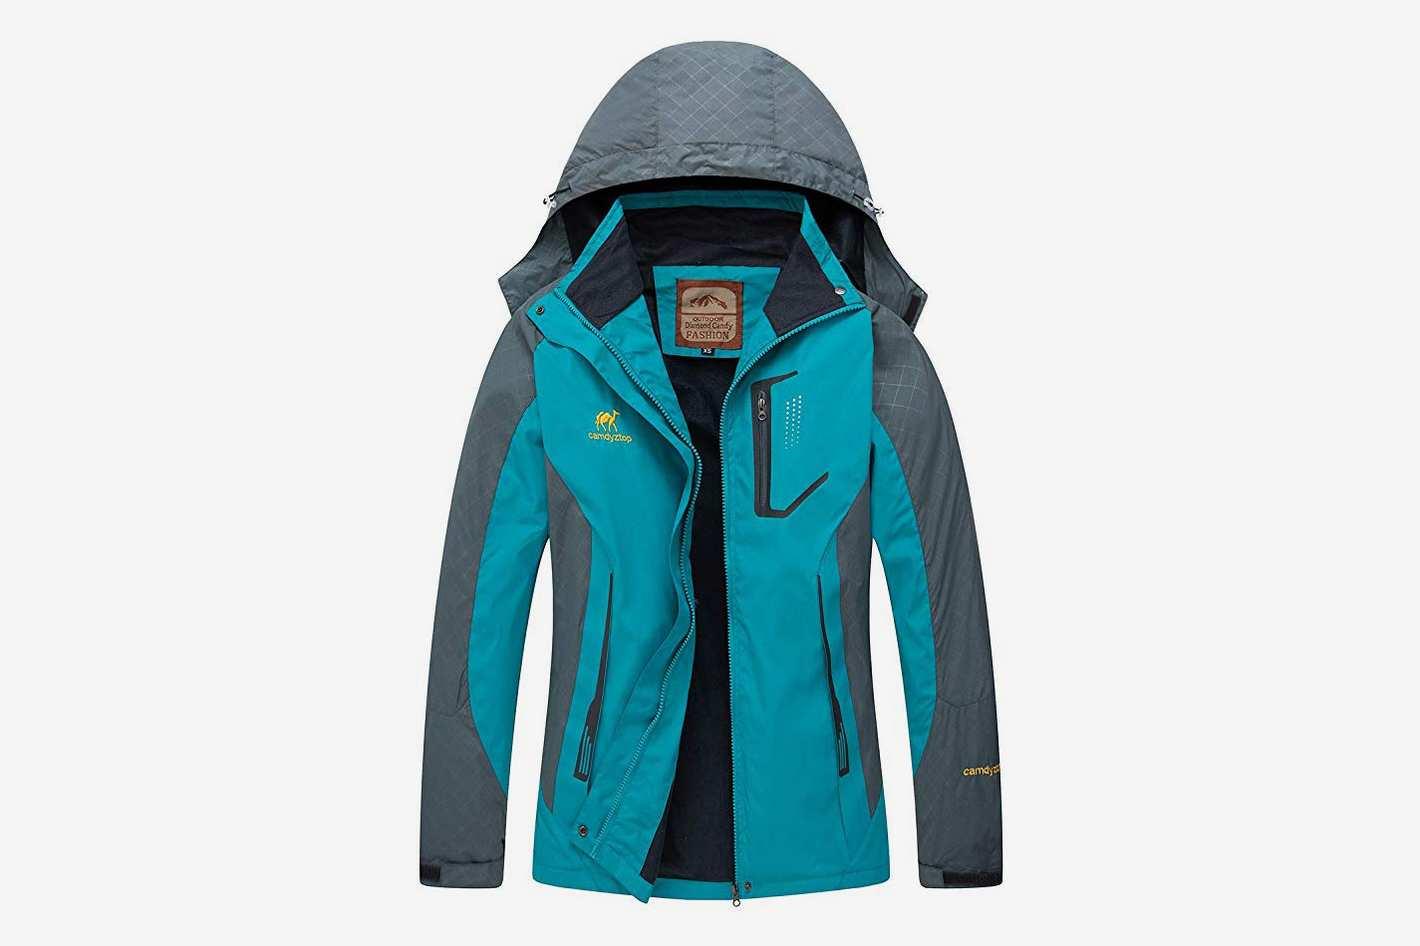 Diamond Candy Waterproof Rain Jacket